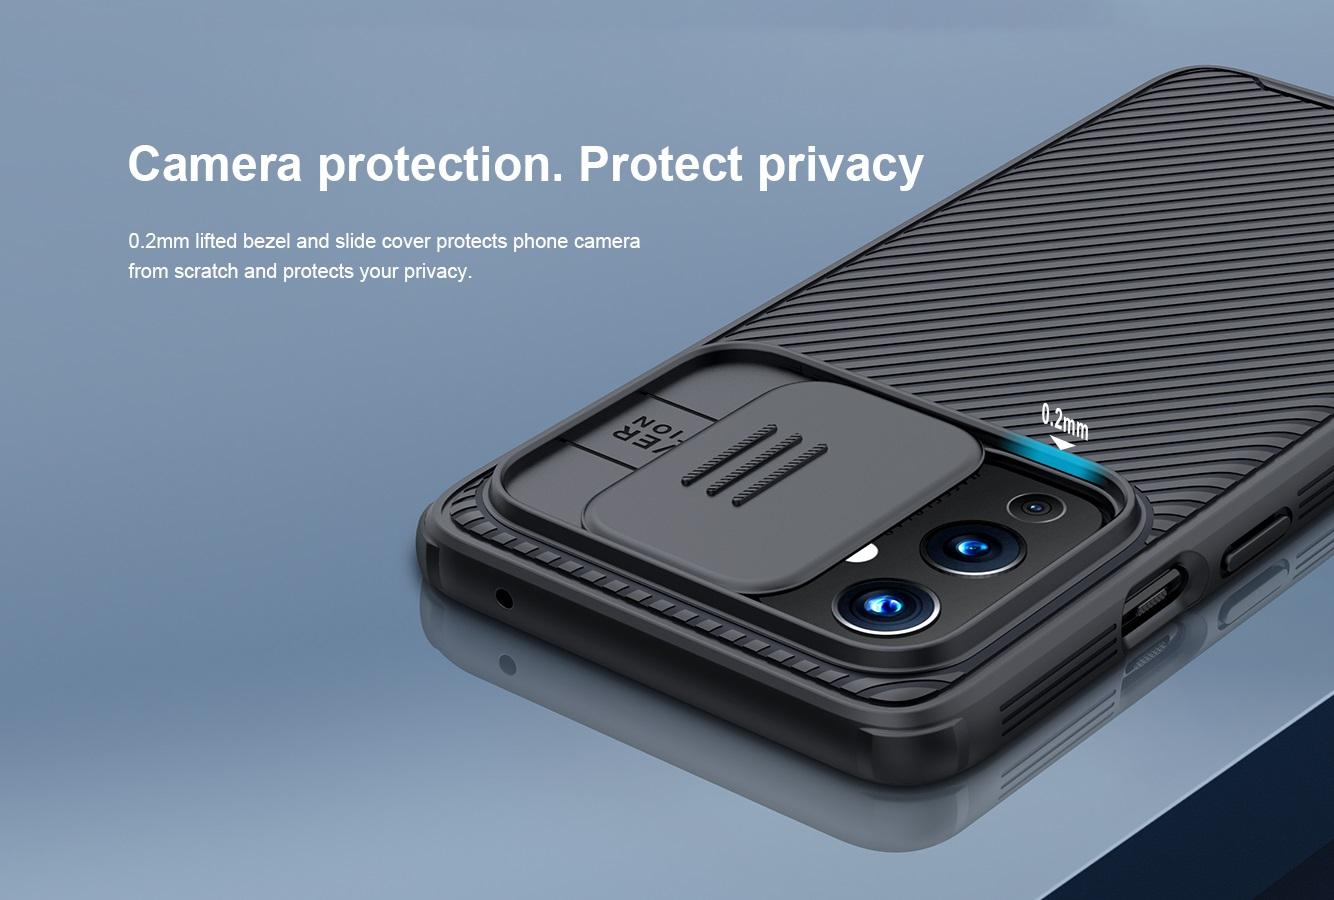 OnePlus_9_CamShield_Pro_Case-02.jpg